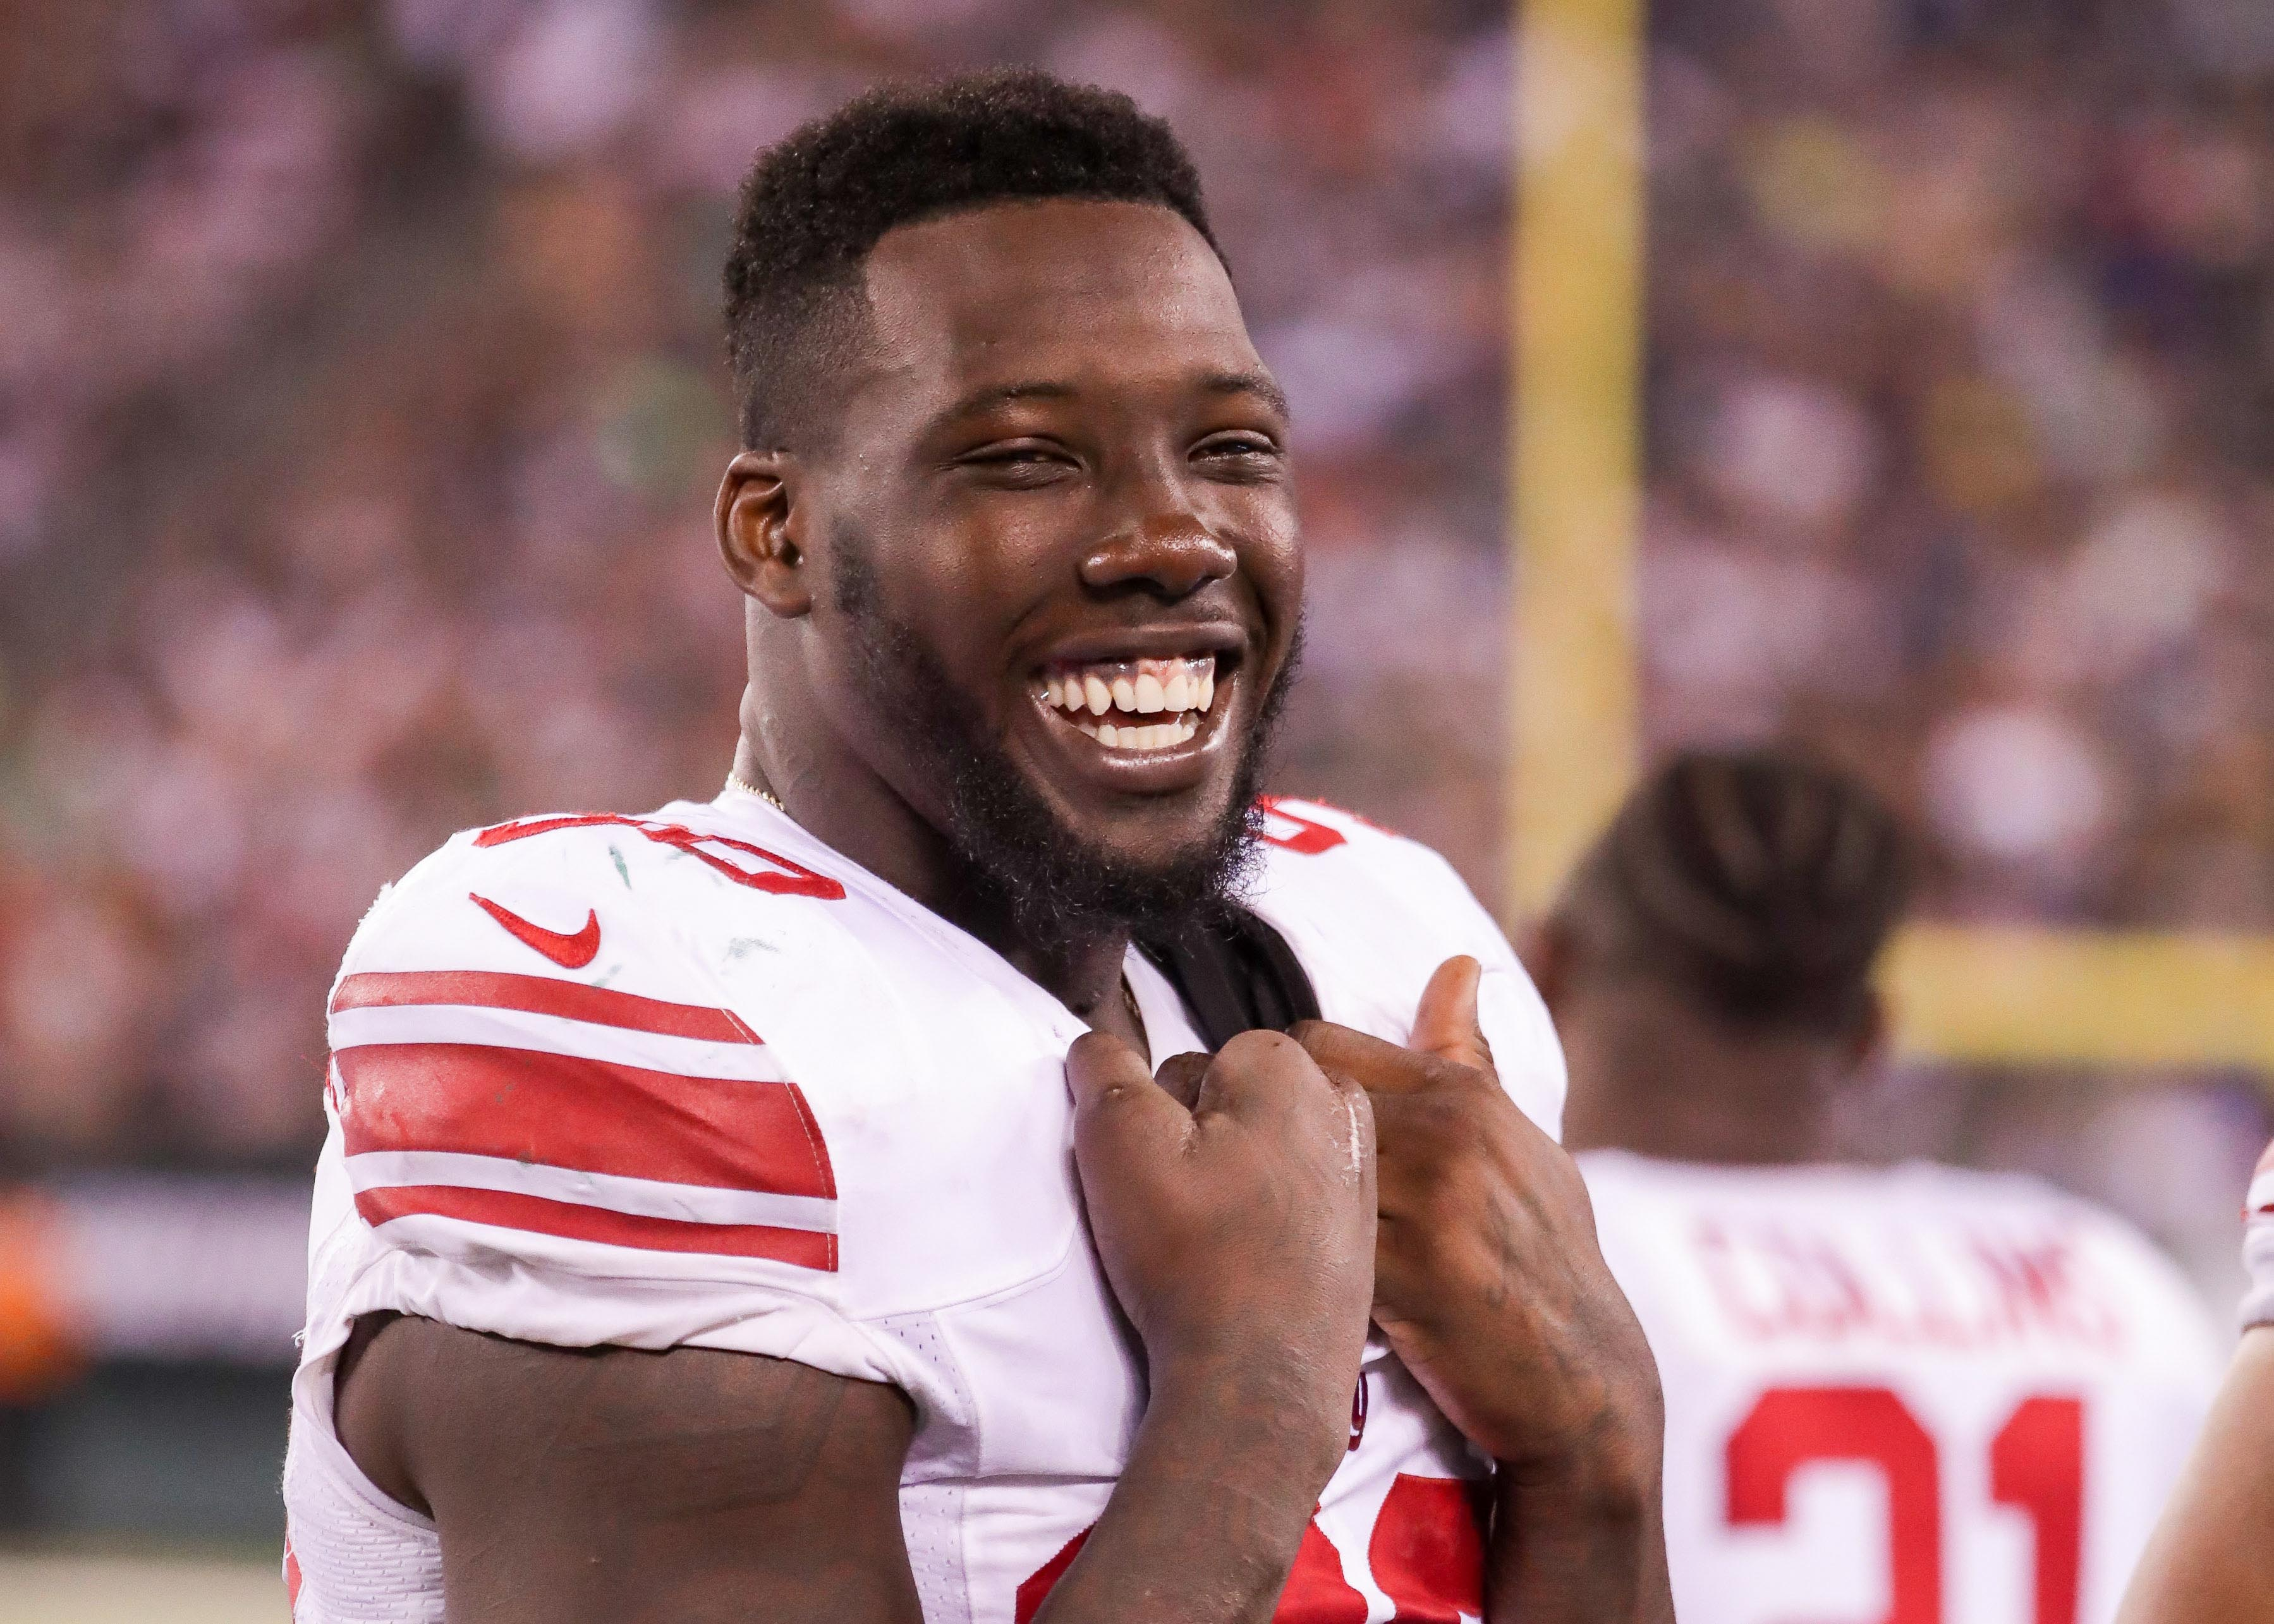 New York Giants Injury Report (10/12): Apple, Pierre-Paul Miss Practice